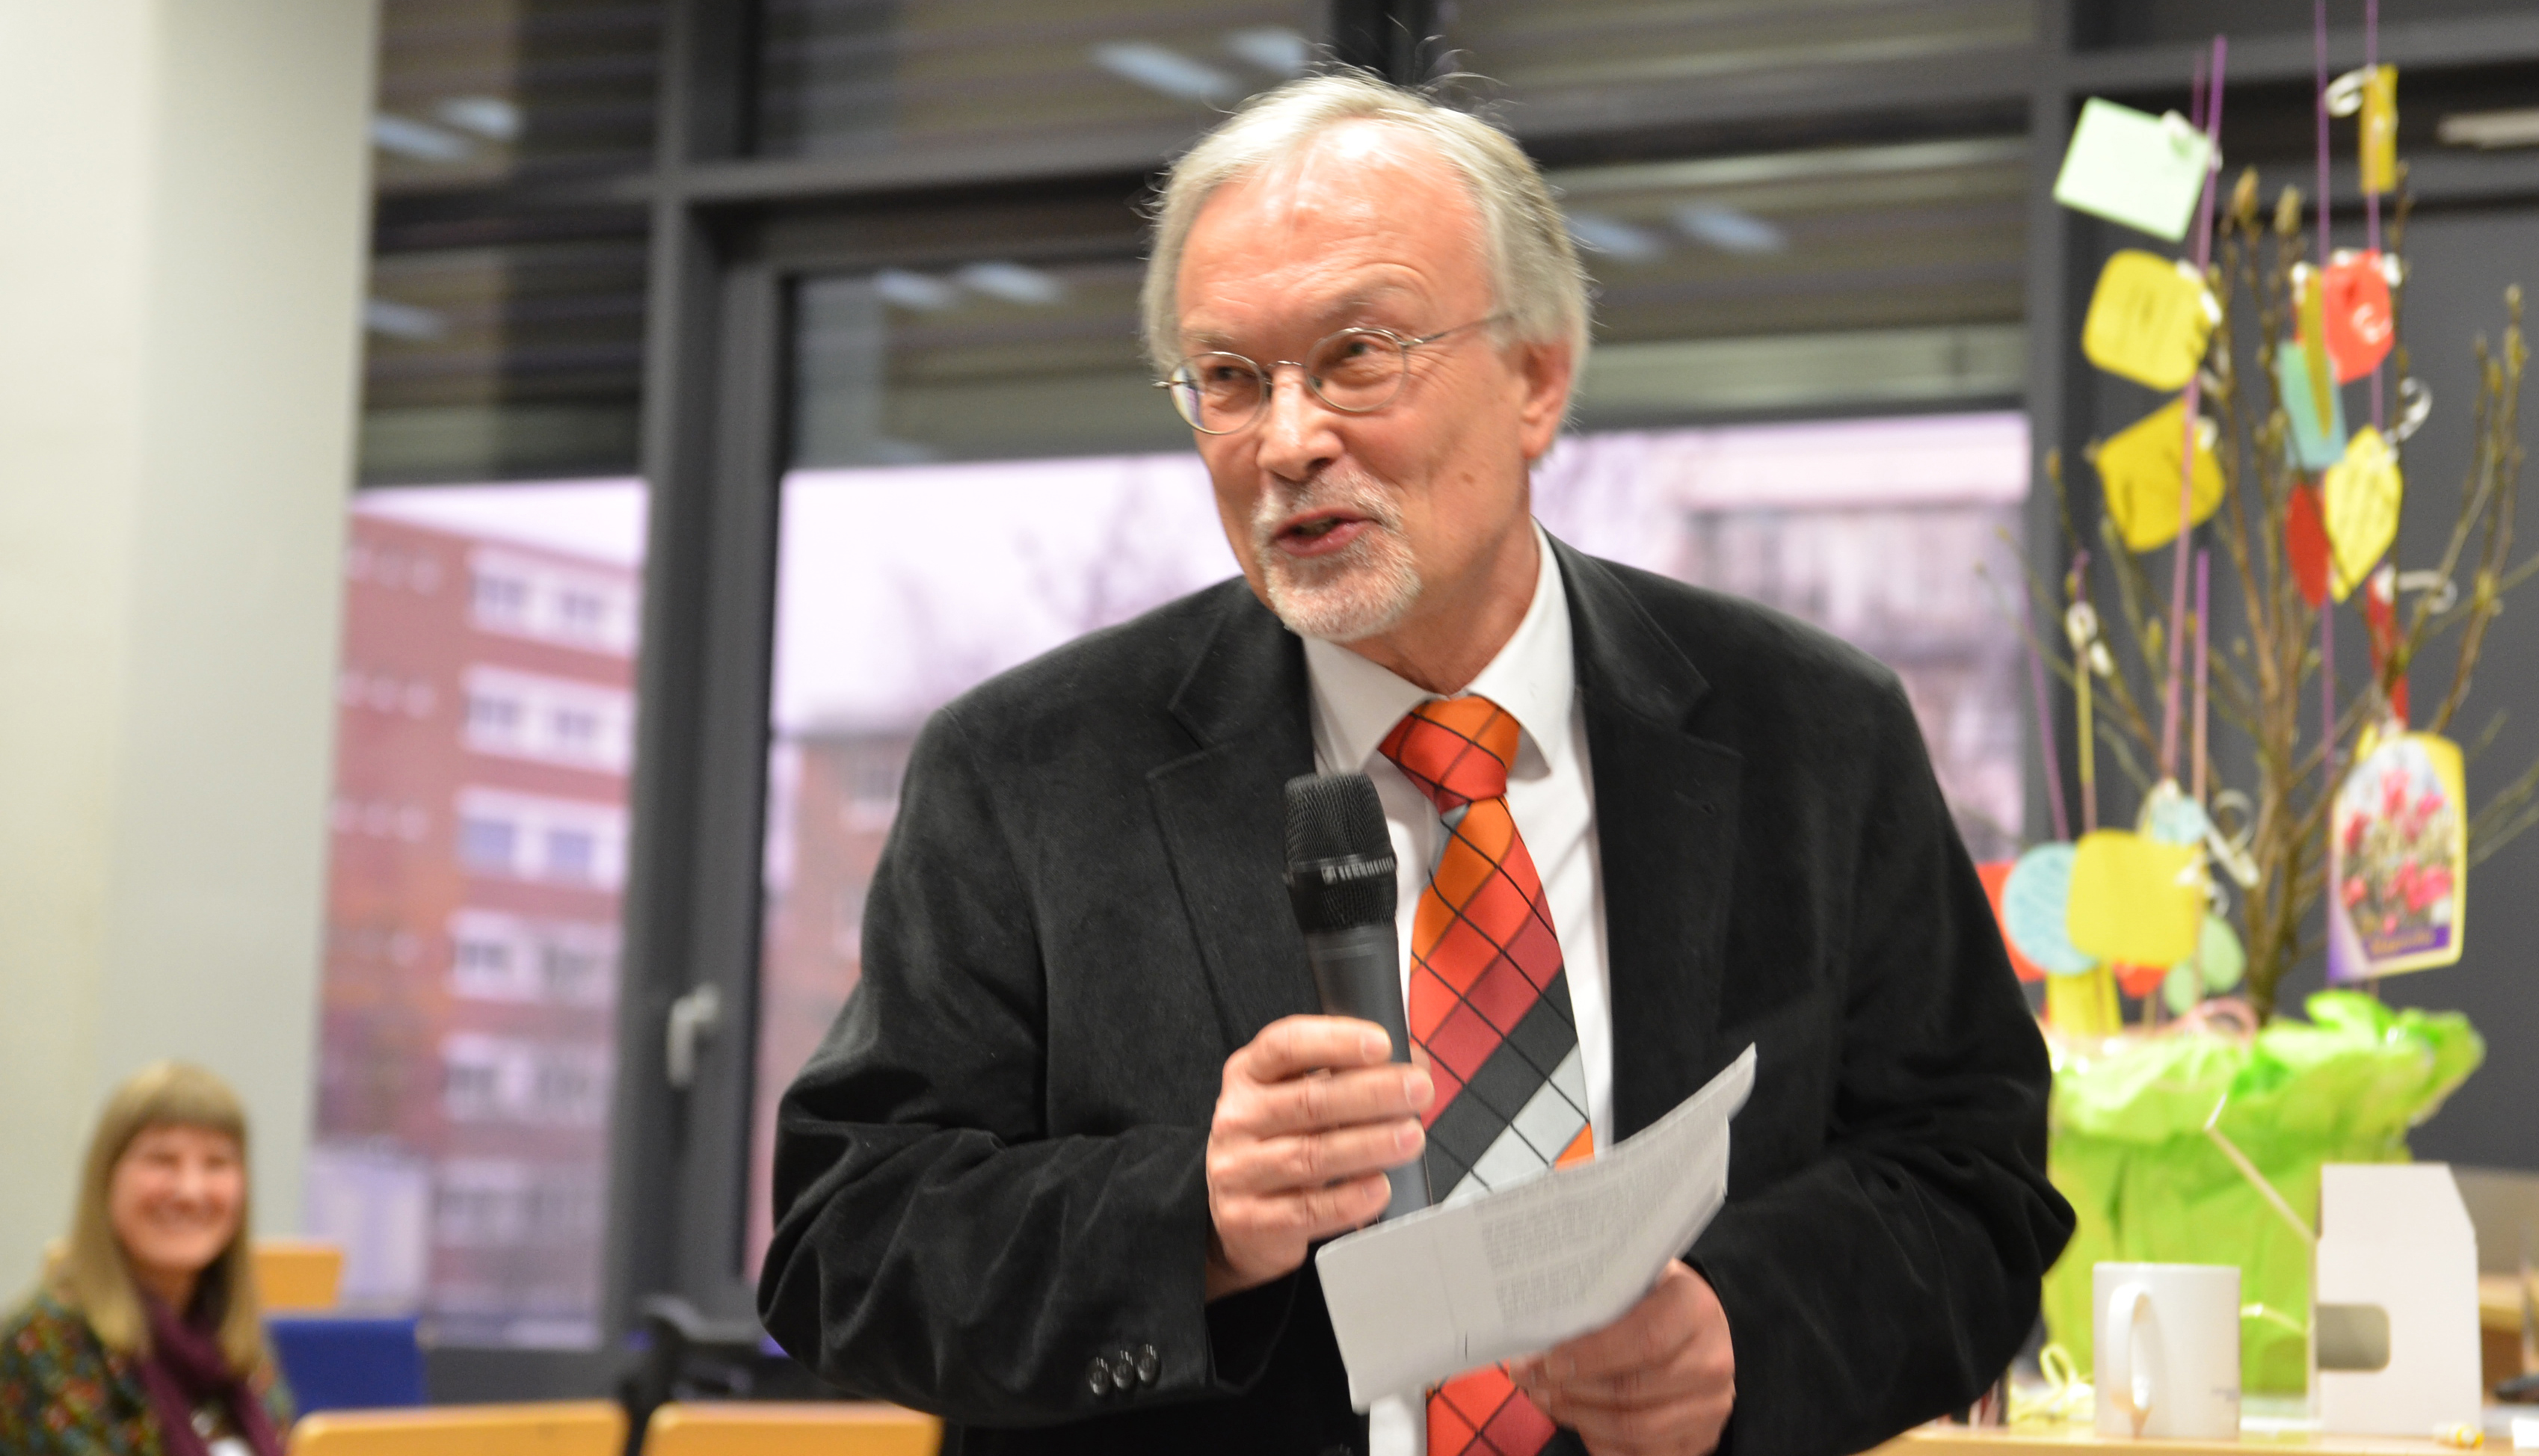 Prof. Dr. Jan Jarre im Hörsaal